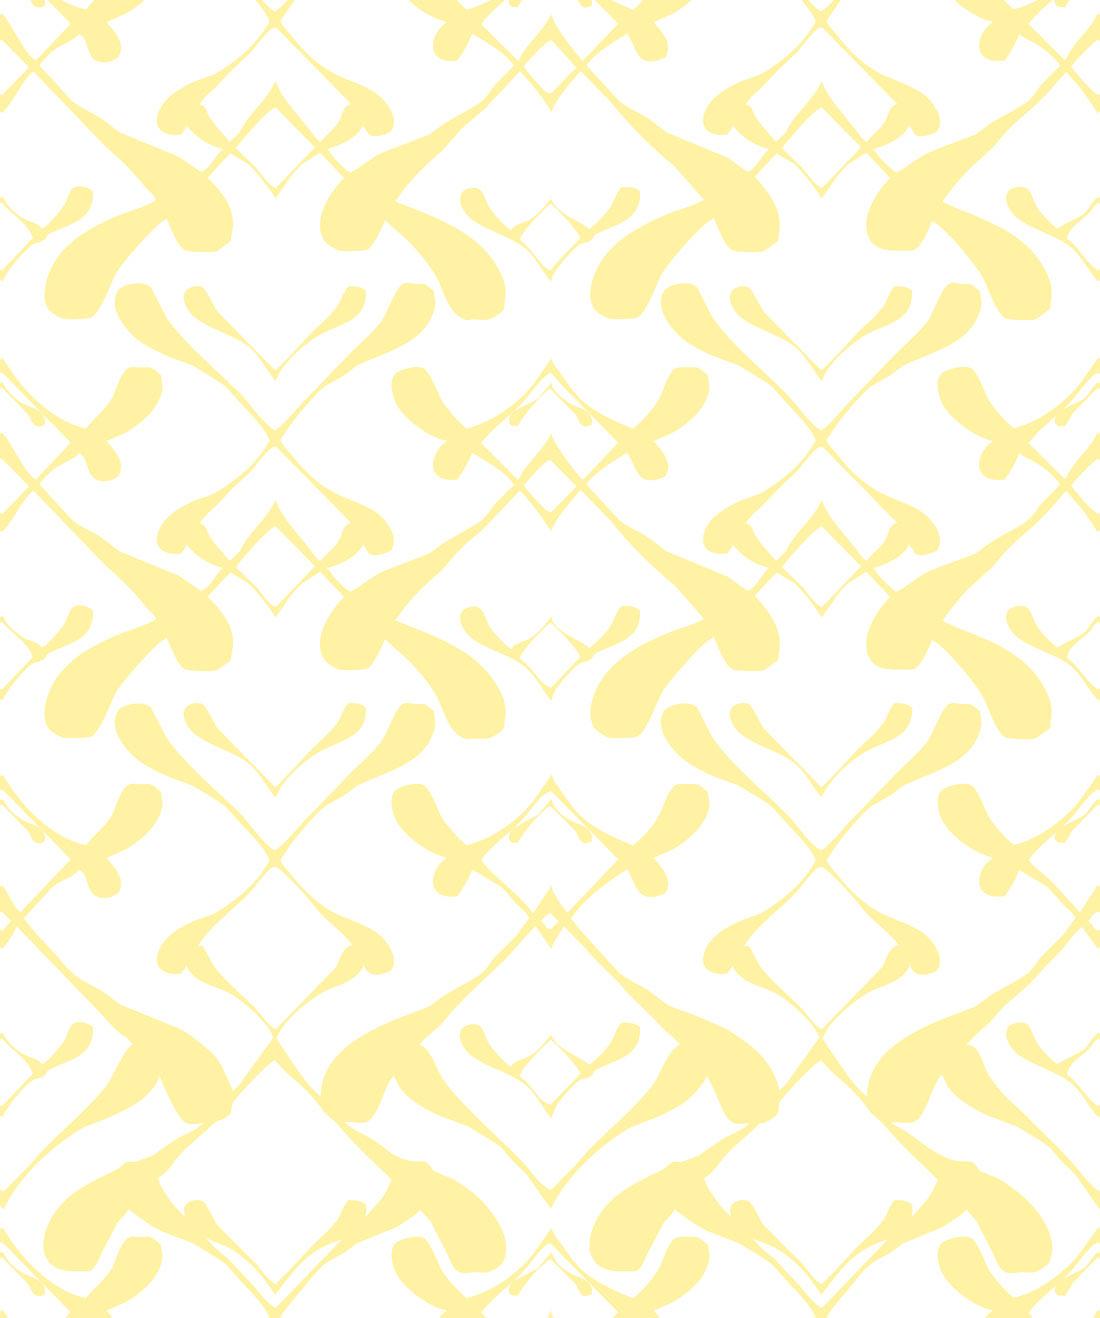 Paper Flock Limoncello Wallpaper